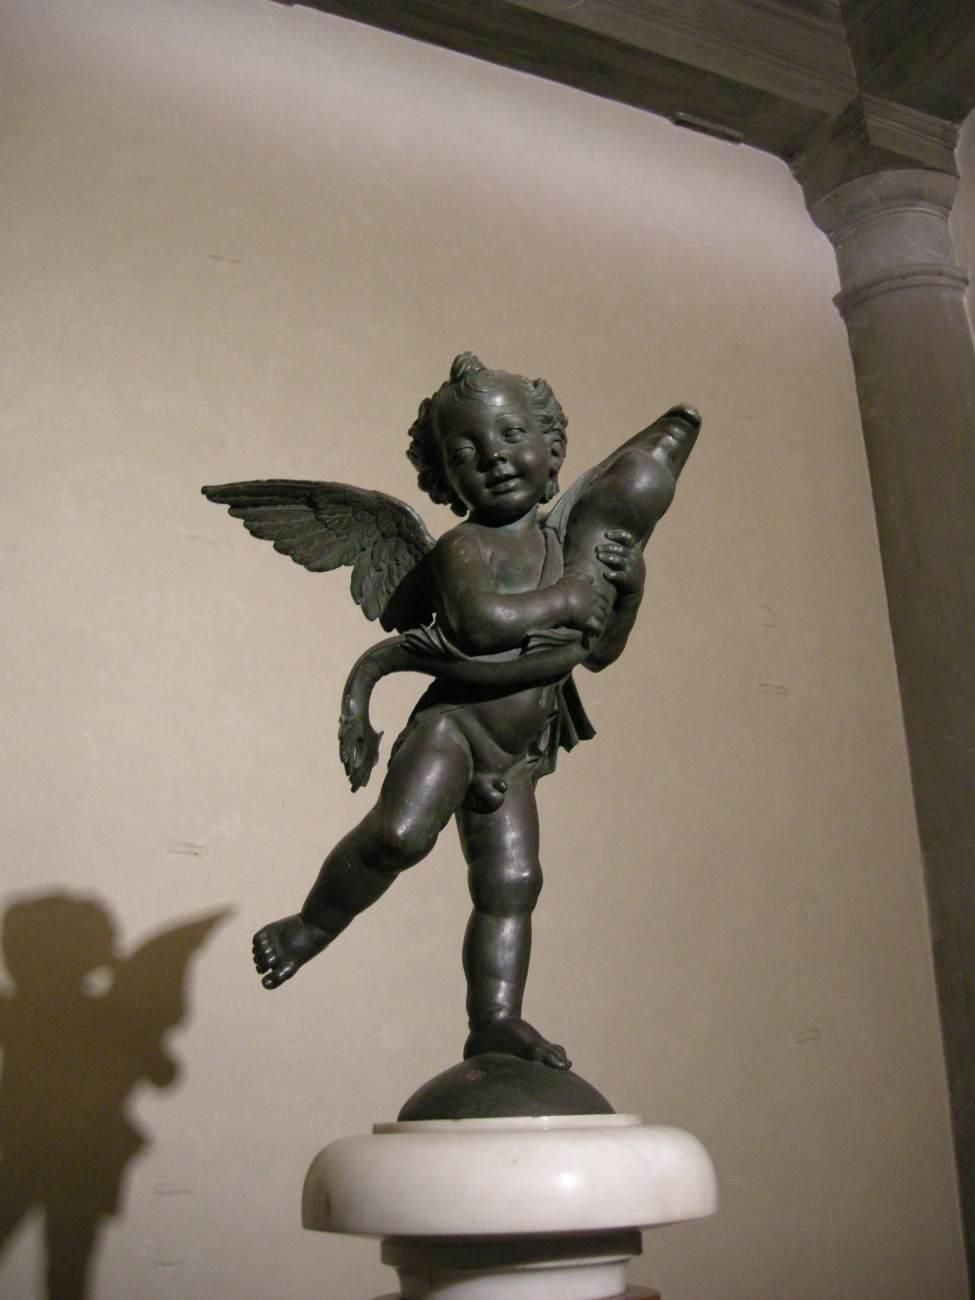 http://www.wga.hu/art/v/verocchi/sculptur/pdolphin.jpg